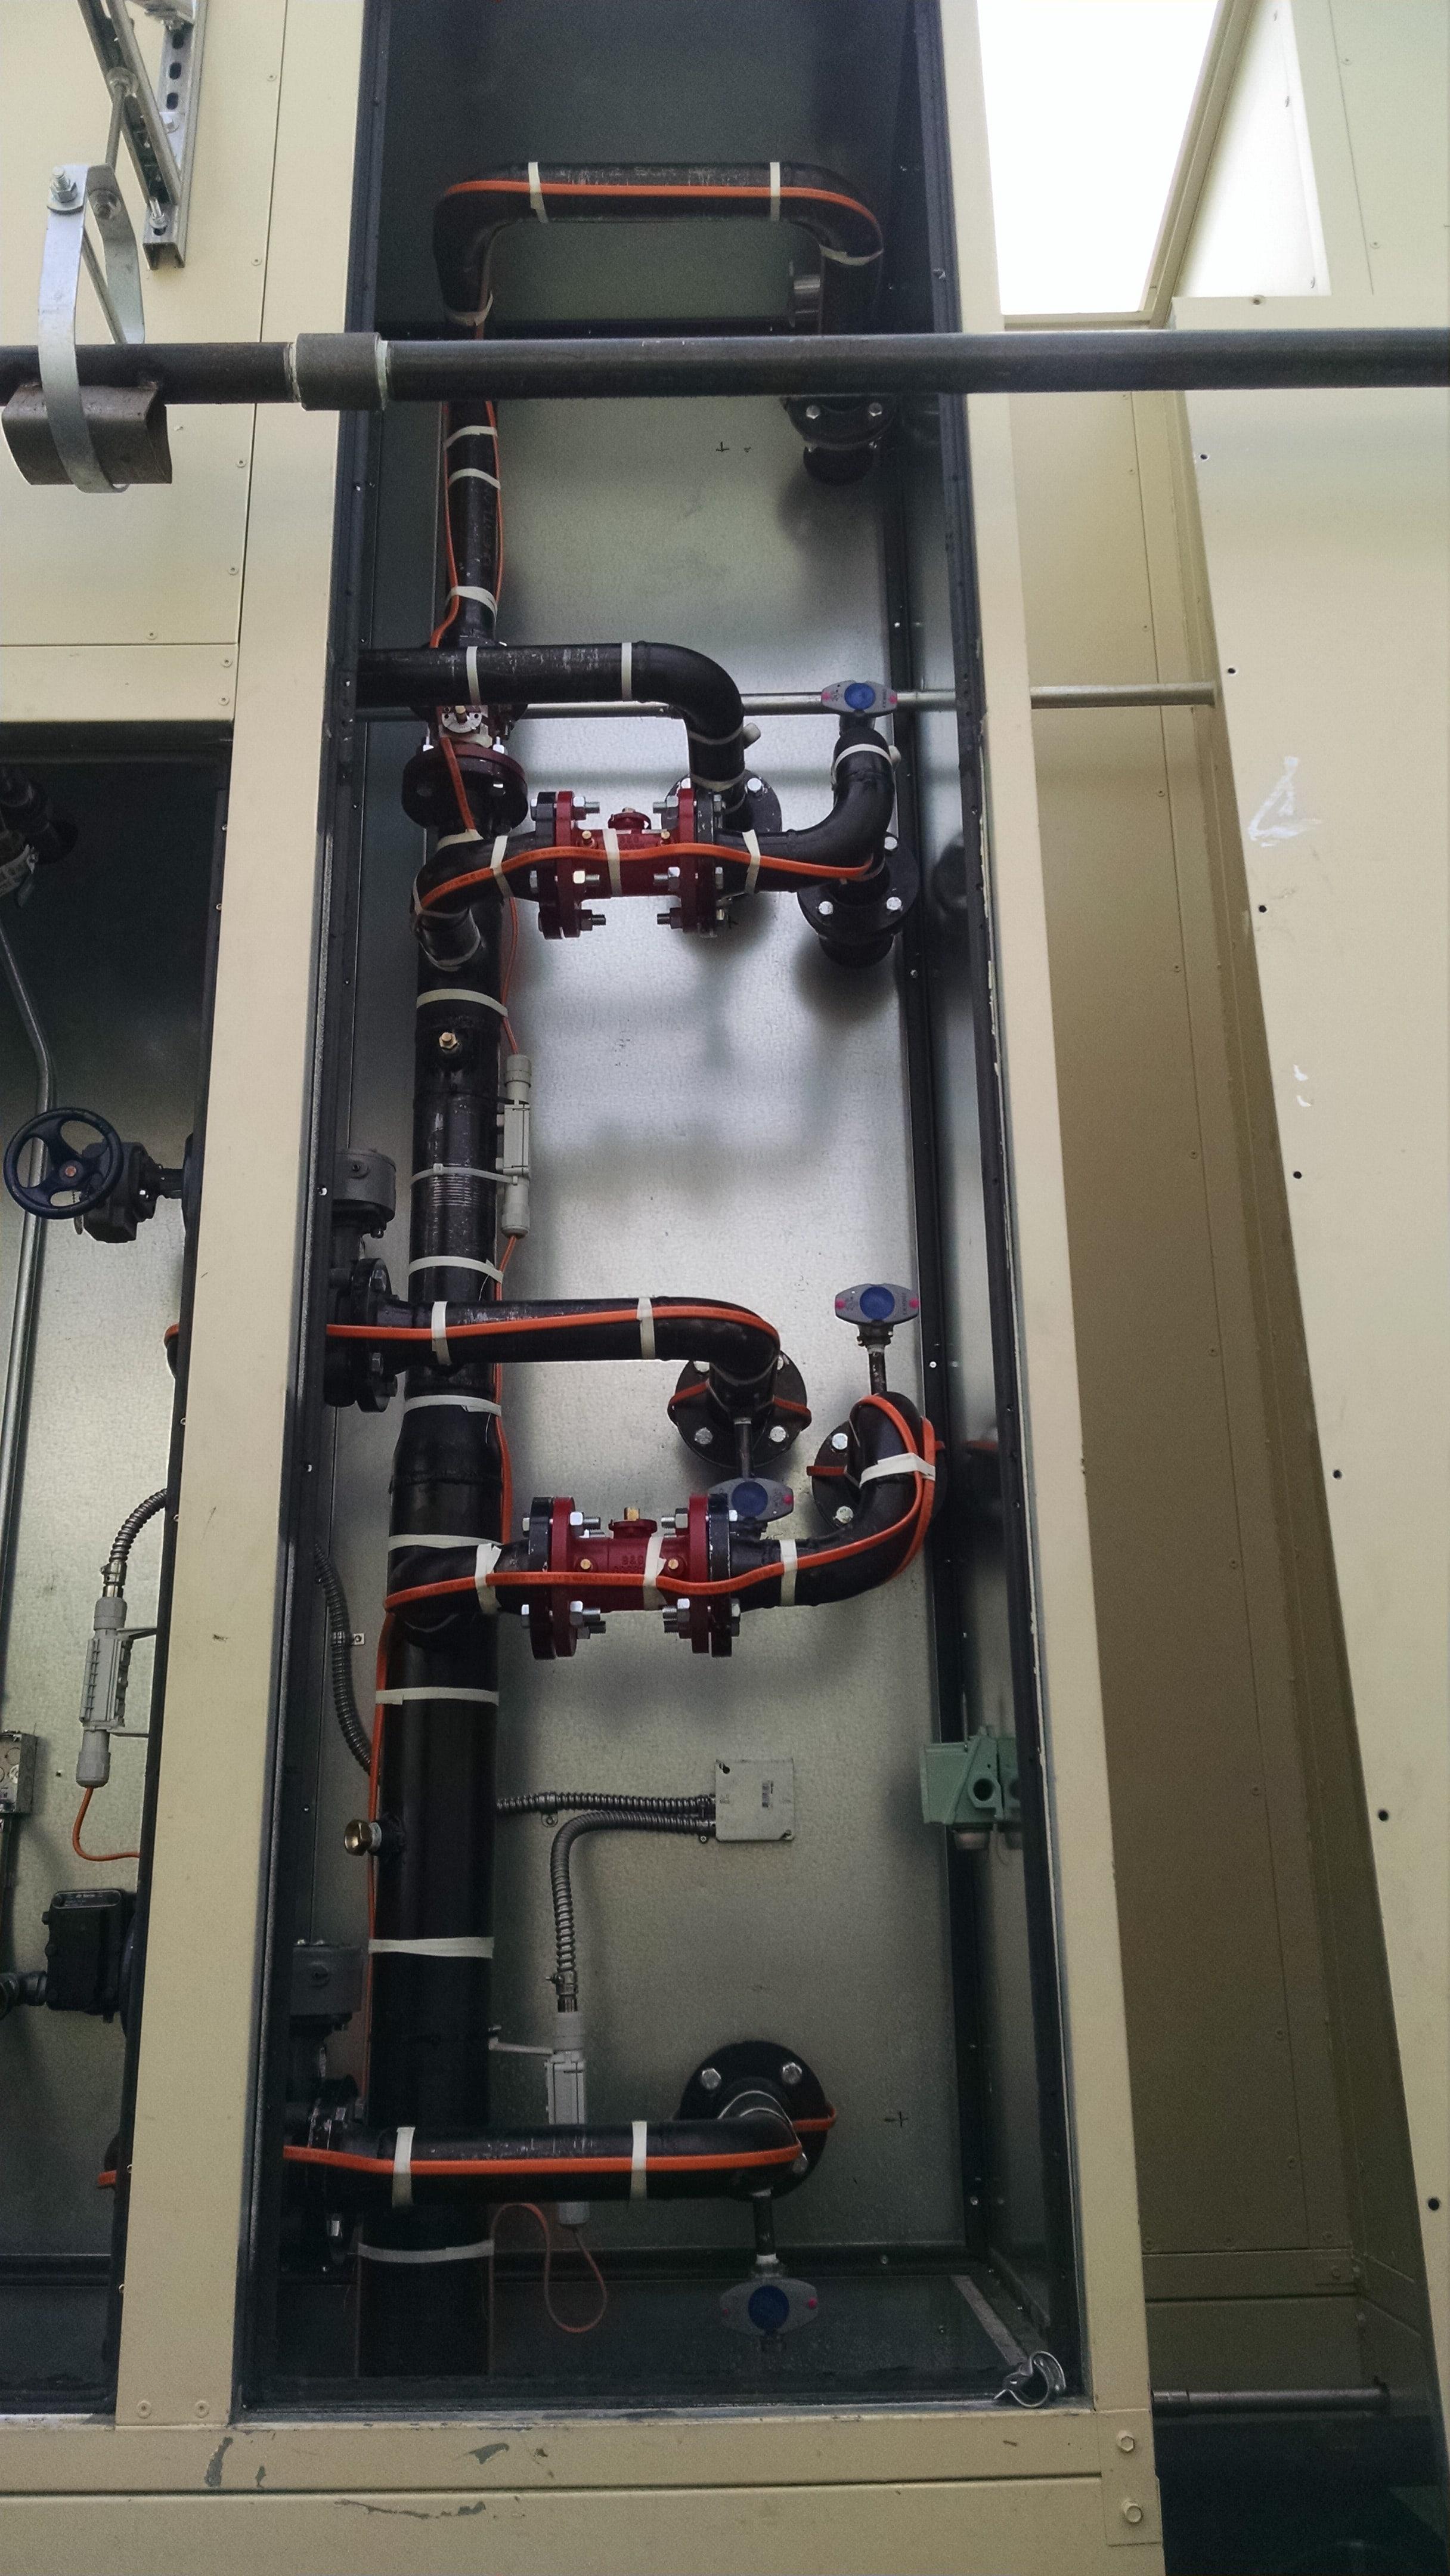 Endoscopy Room Floor Plan: UC Holmes Hospital